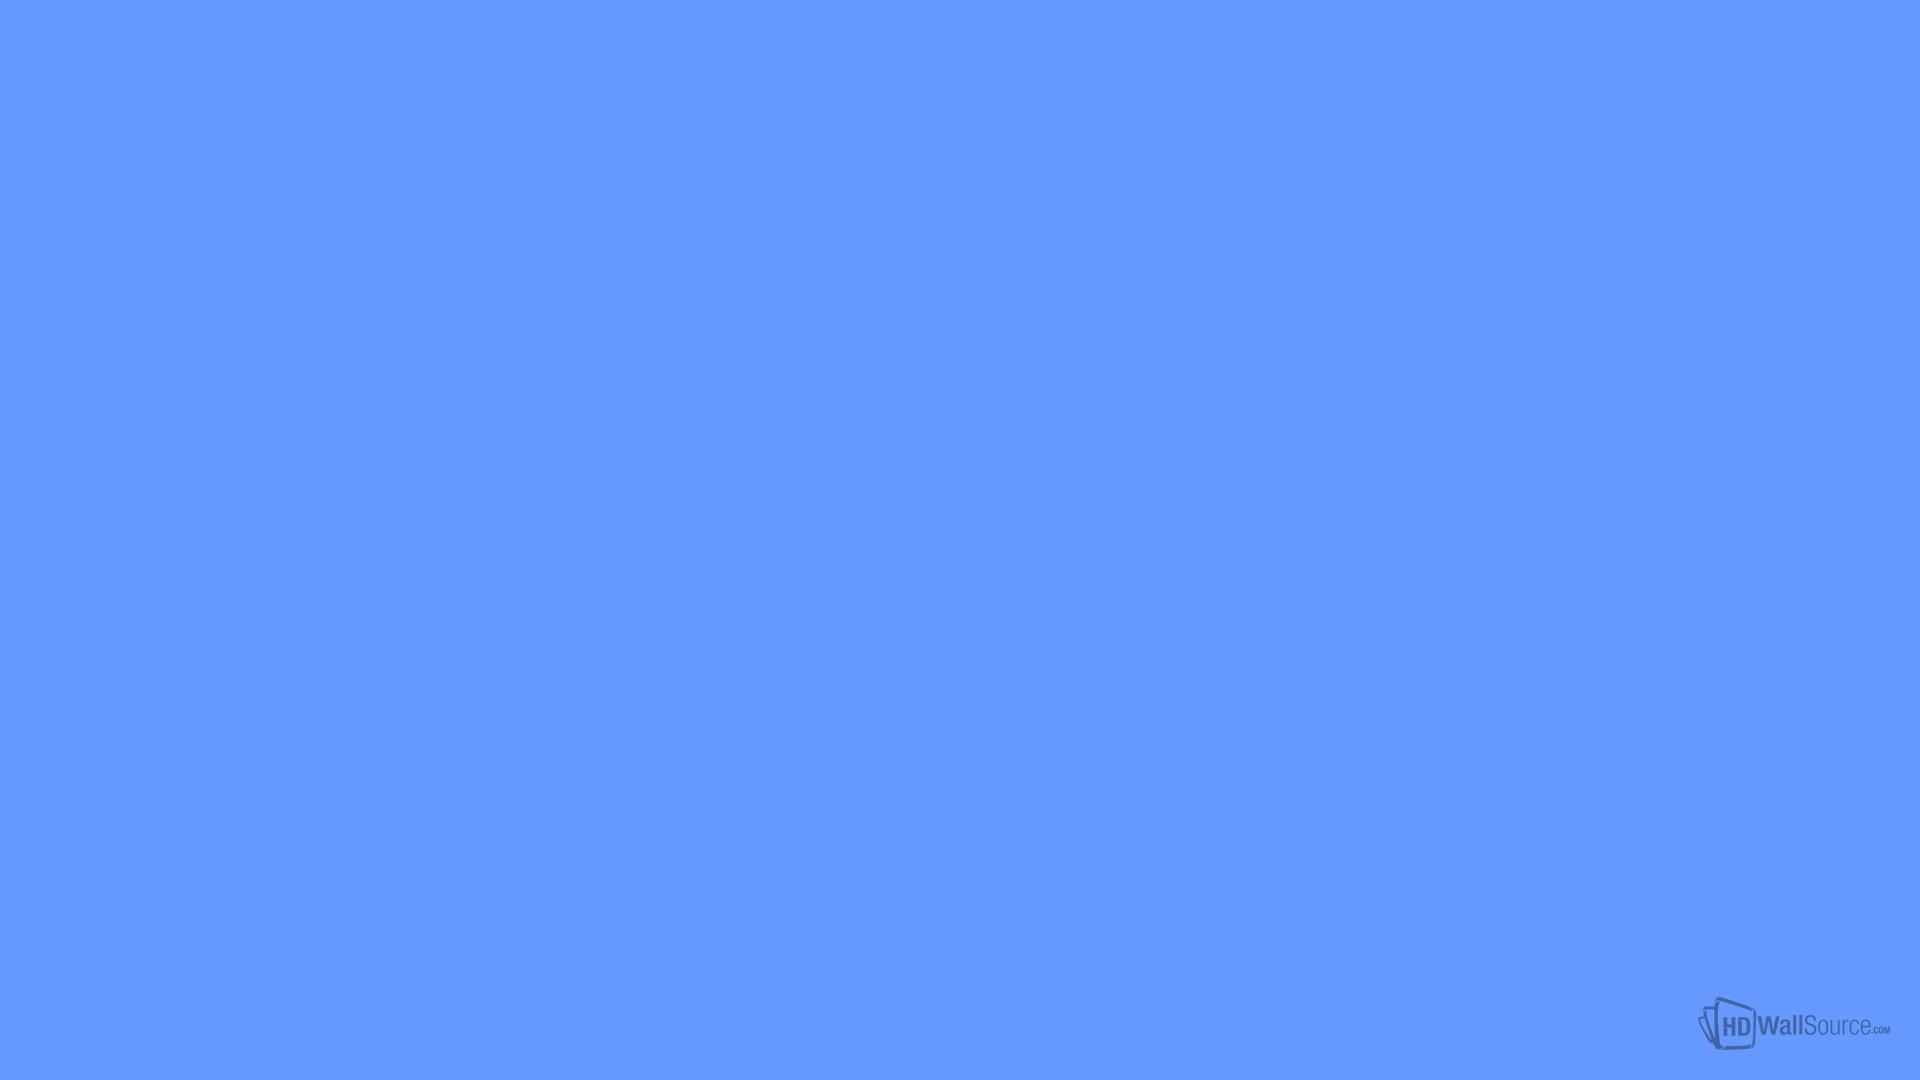 6699ff wallpaper 71073